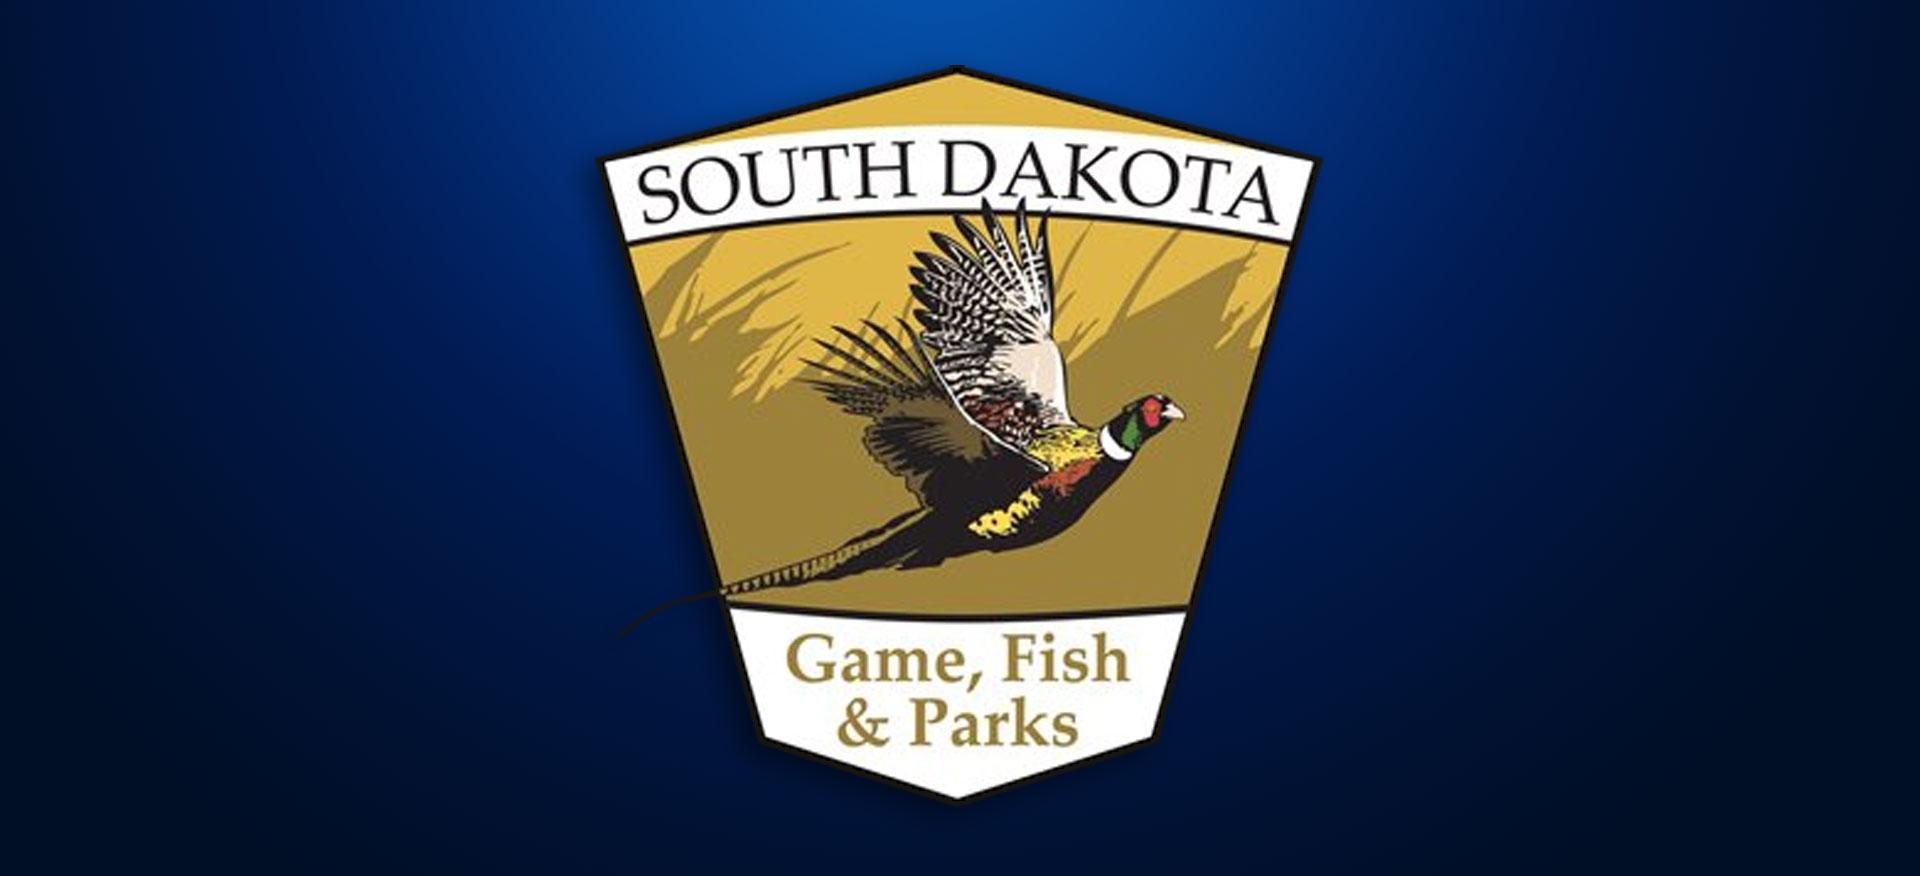 South dakota gf p to conduct walleye study for South dakota game and fish